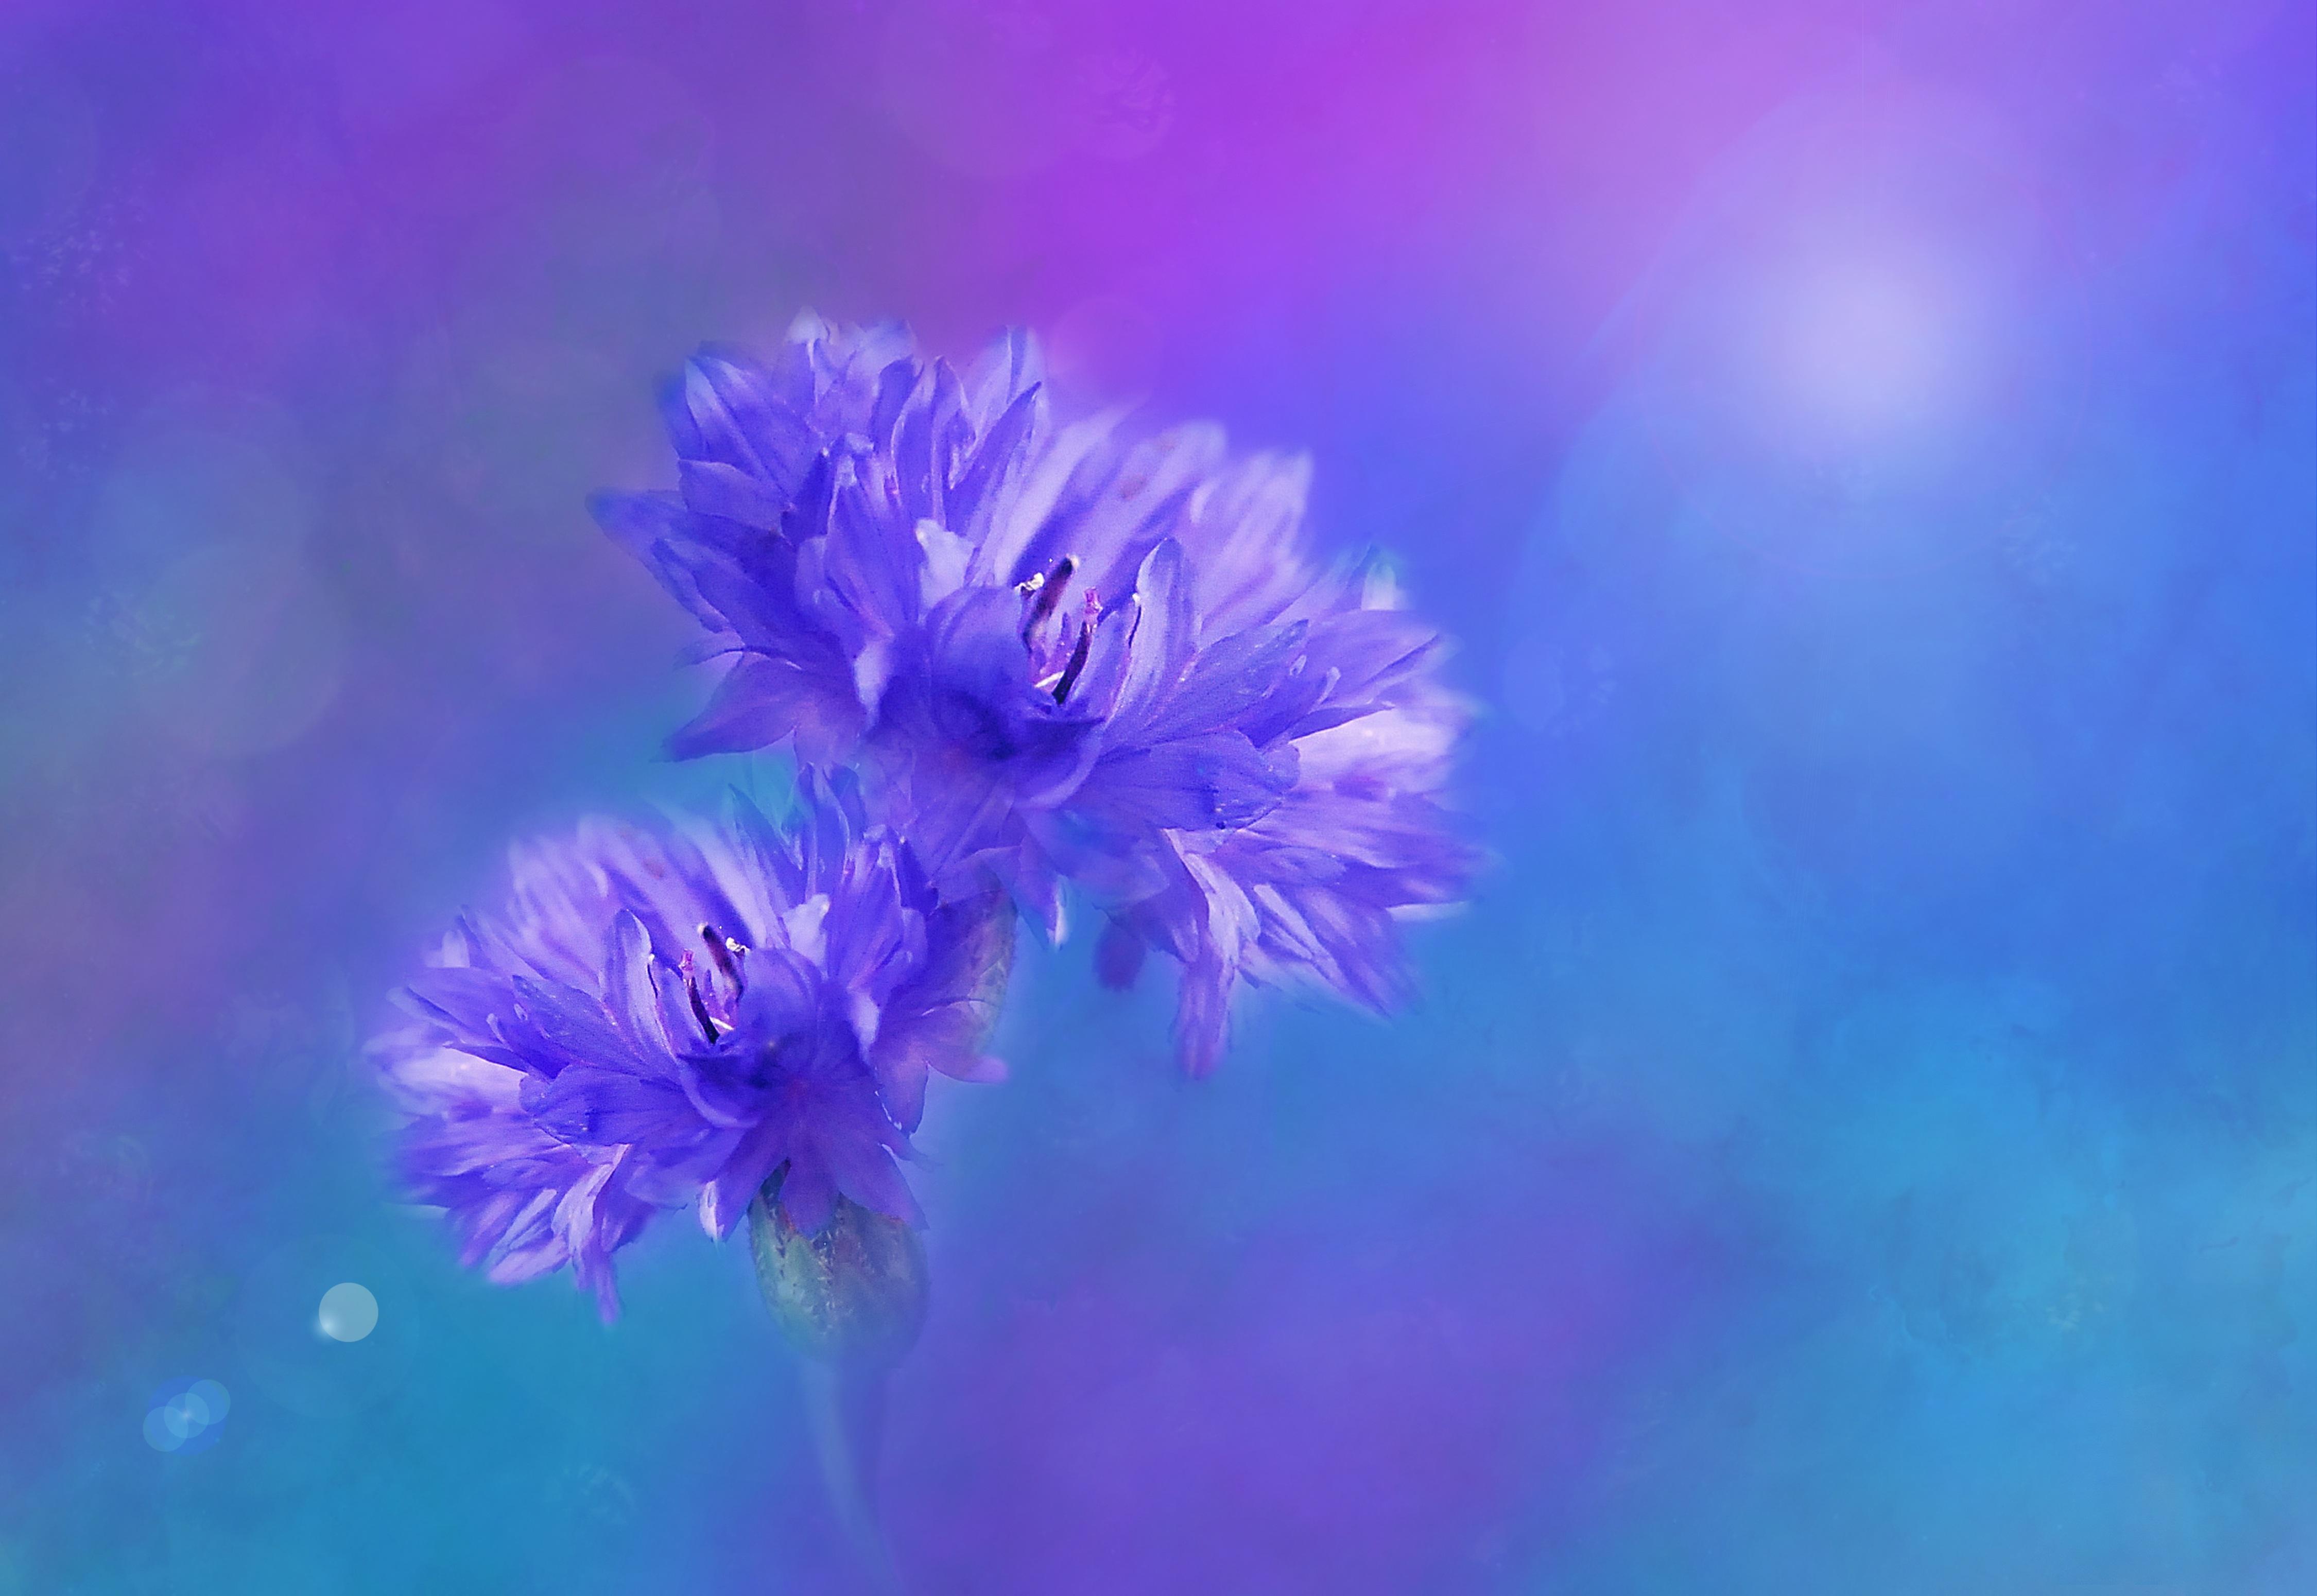 Free Images Nature Blossom Bokeh Sky Purple Petal Bloom